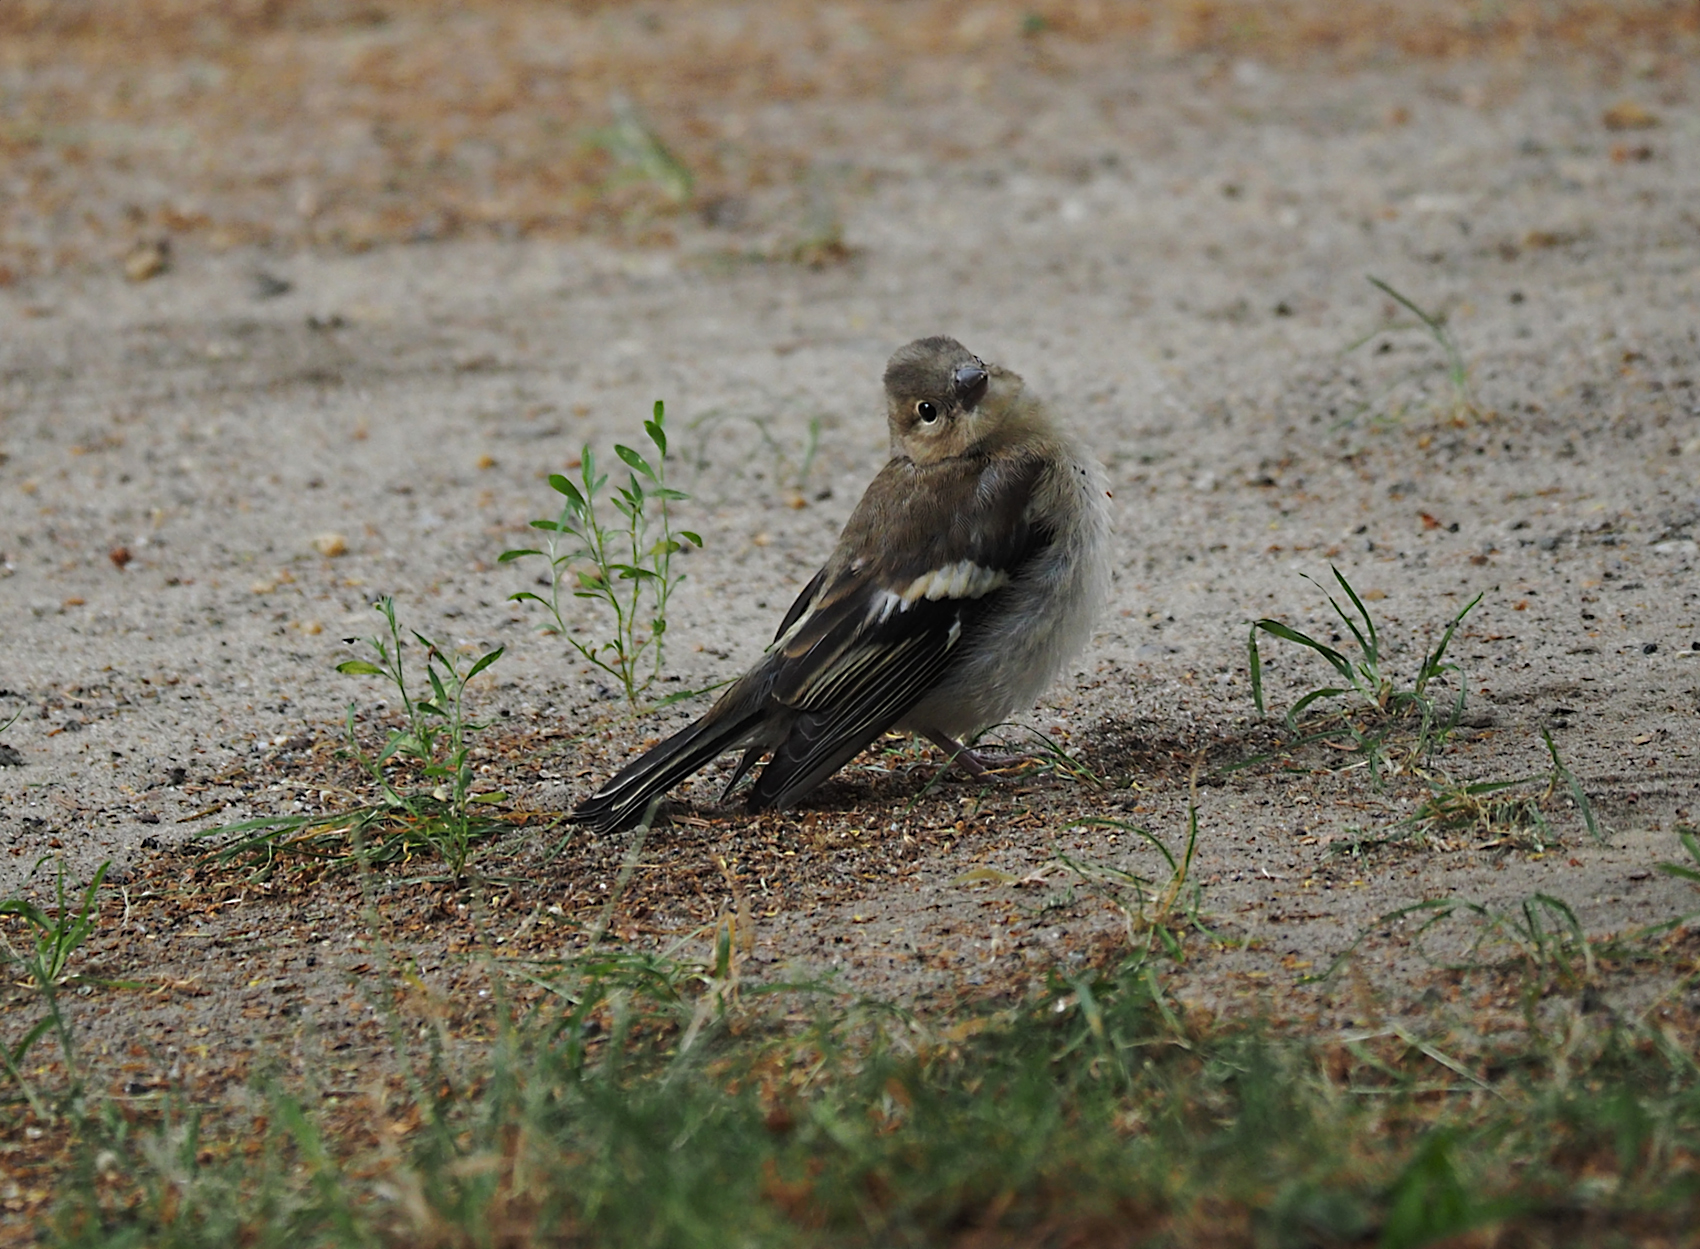 Buchfink juvenil01 (Fringilla coelebs)